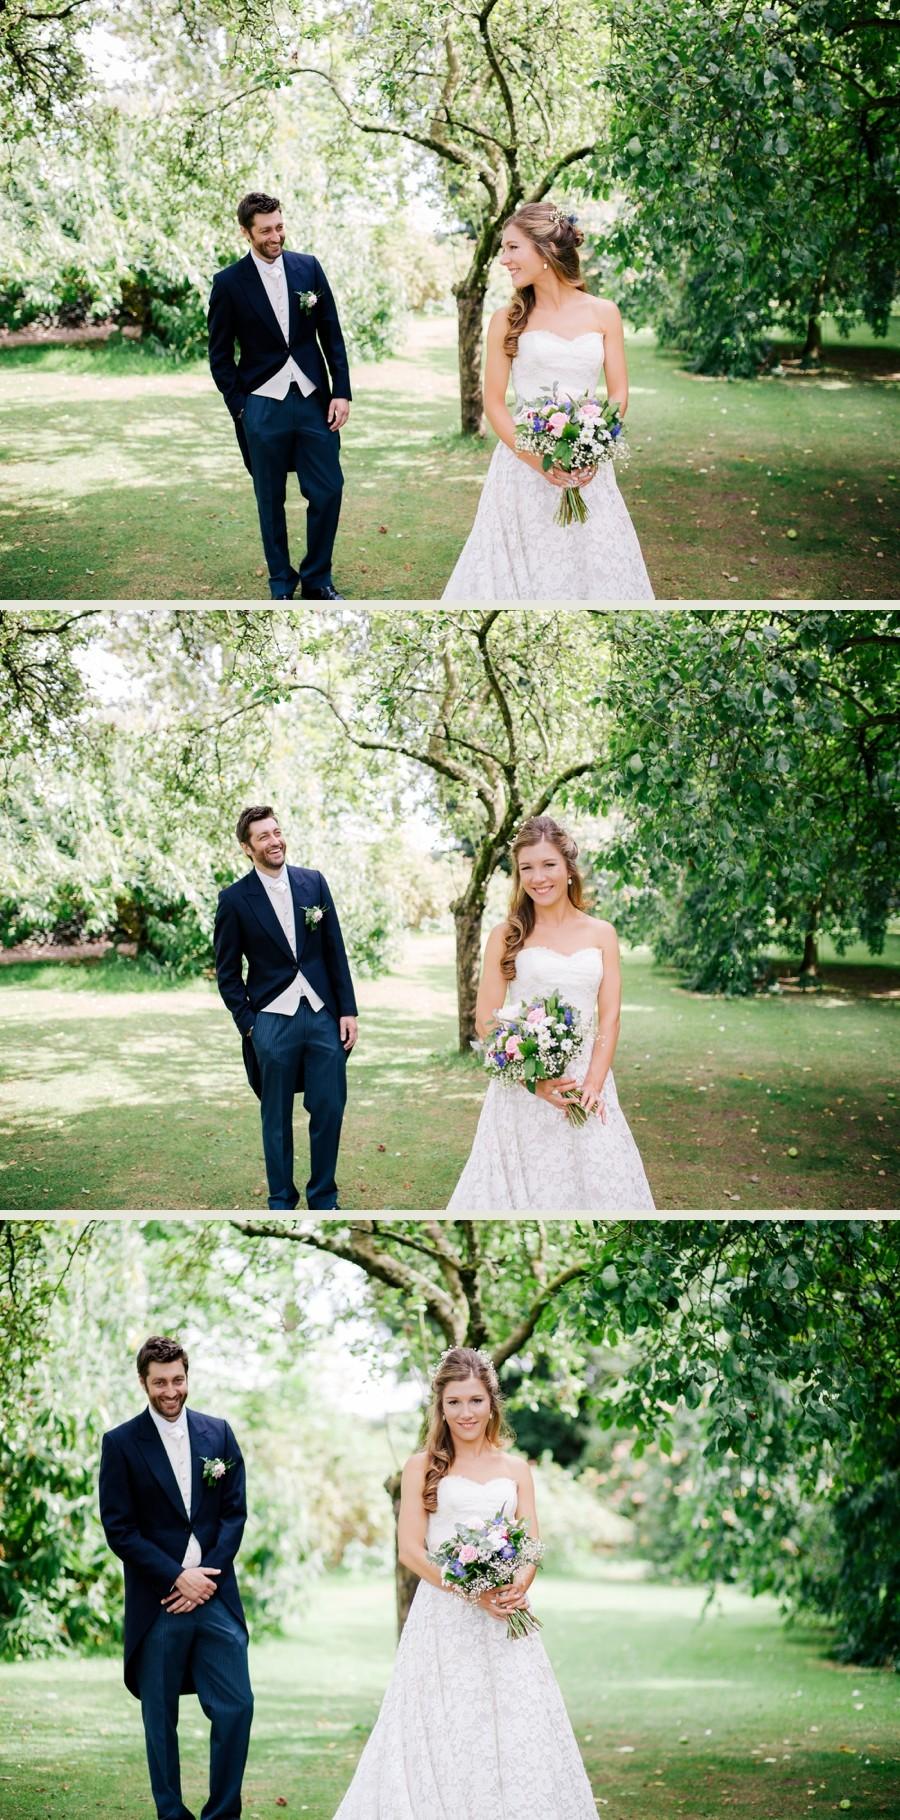 Staffordshire Wedding Photographer Packington Moor Wedding Lee and Emily_0015